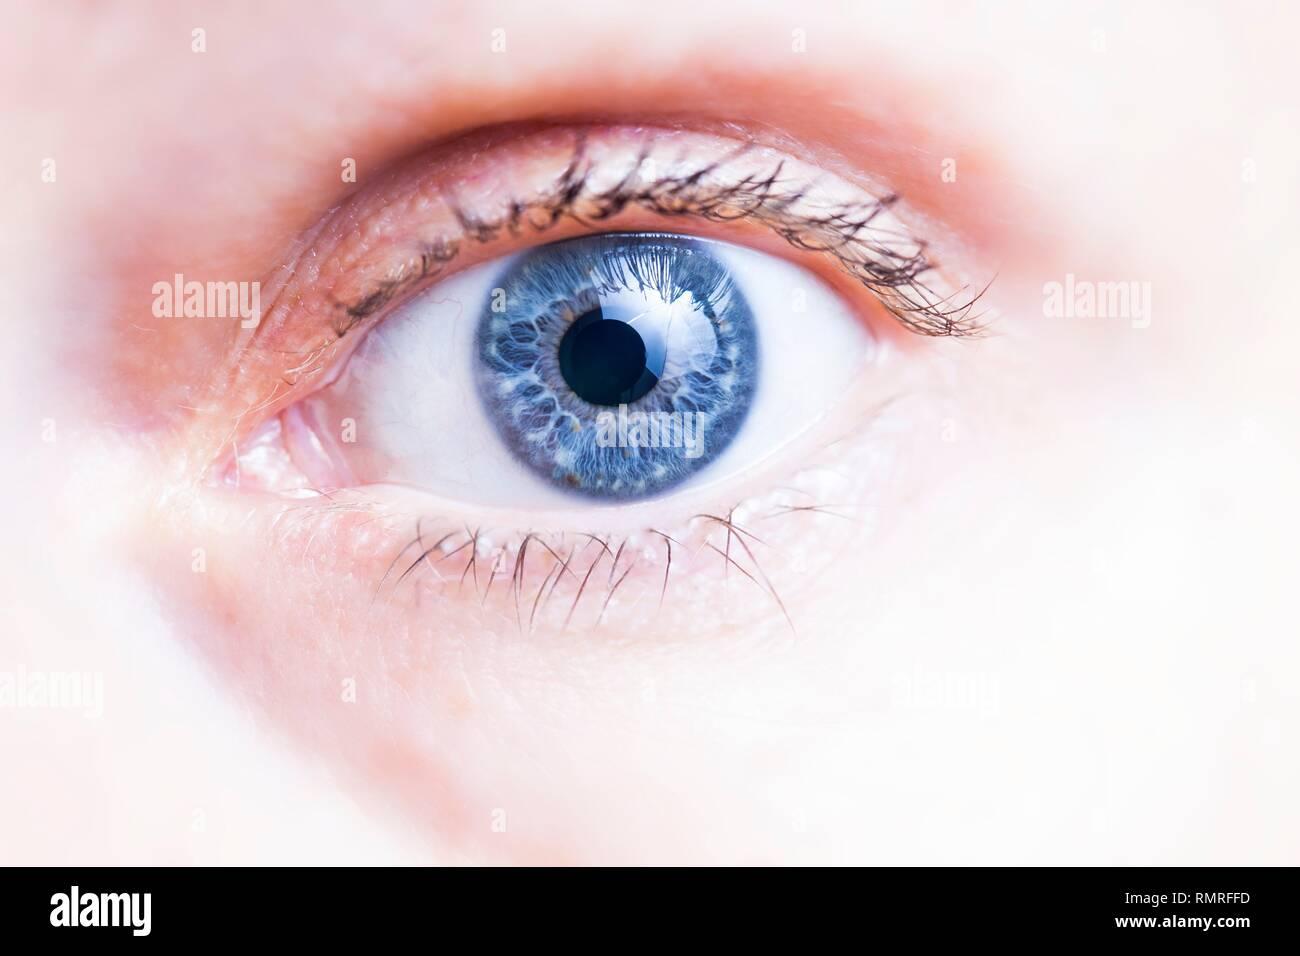 Cerca del ojo humano sano Foto & Imagen De Stock: 236544993